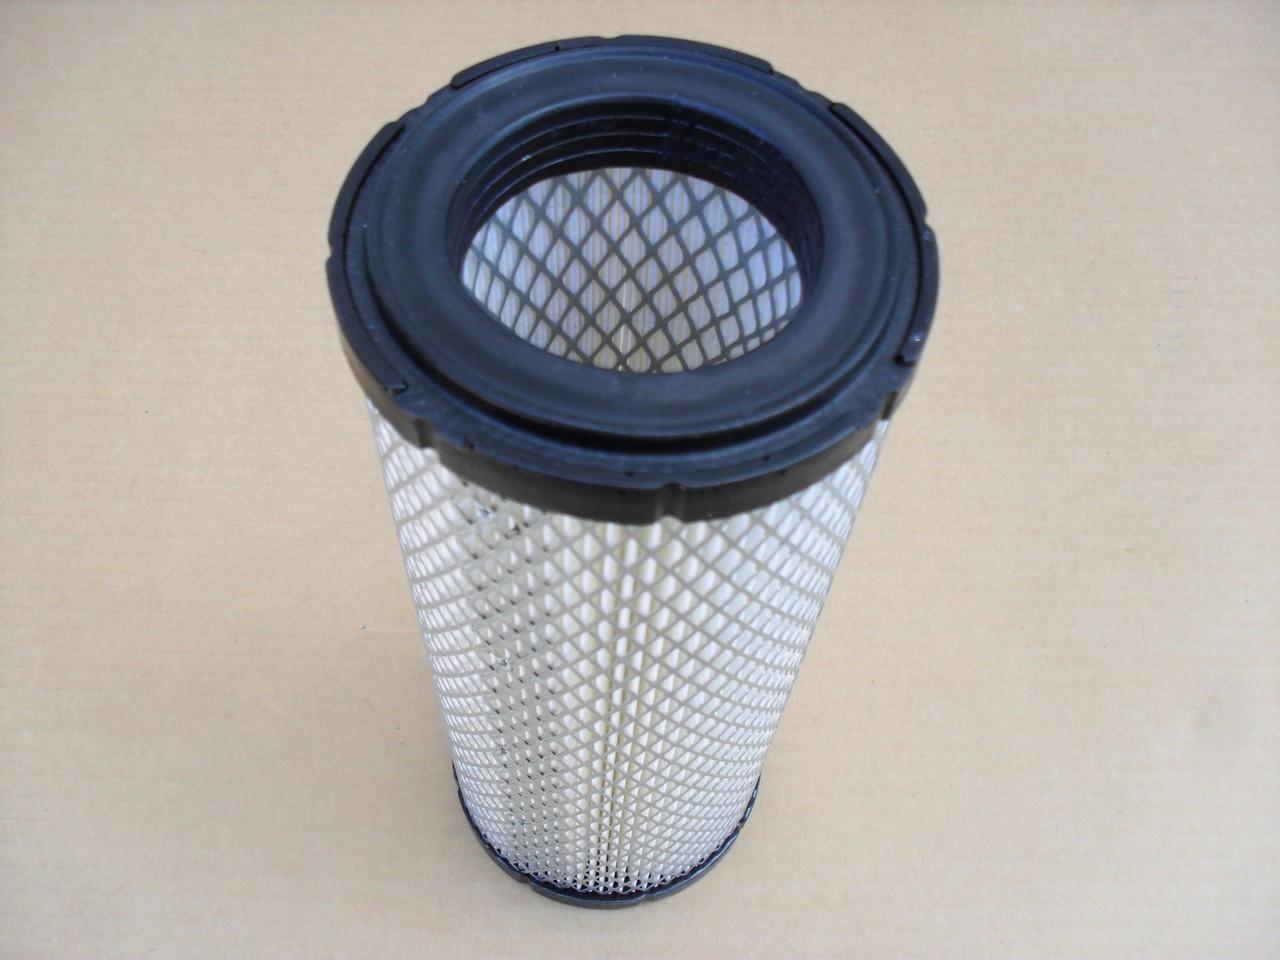 Stens 100-780 Inner Air Filter for Briggs /& Stratton John Deere Kubota Mowers